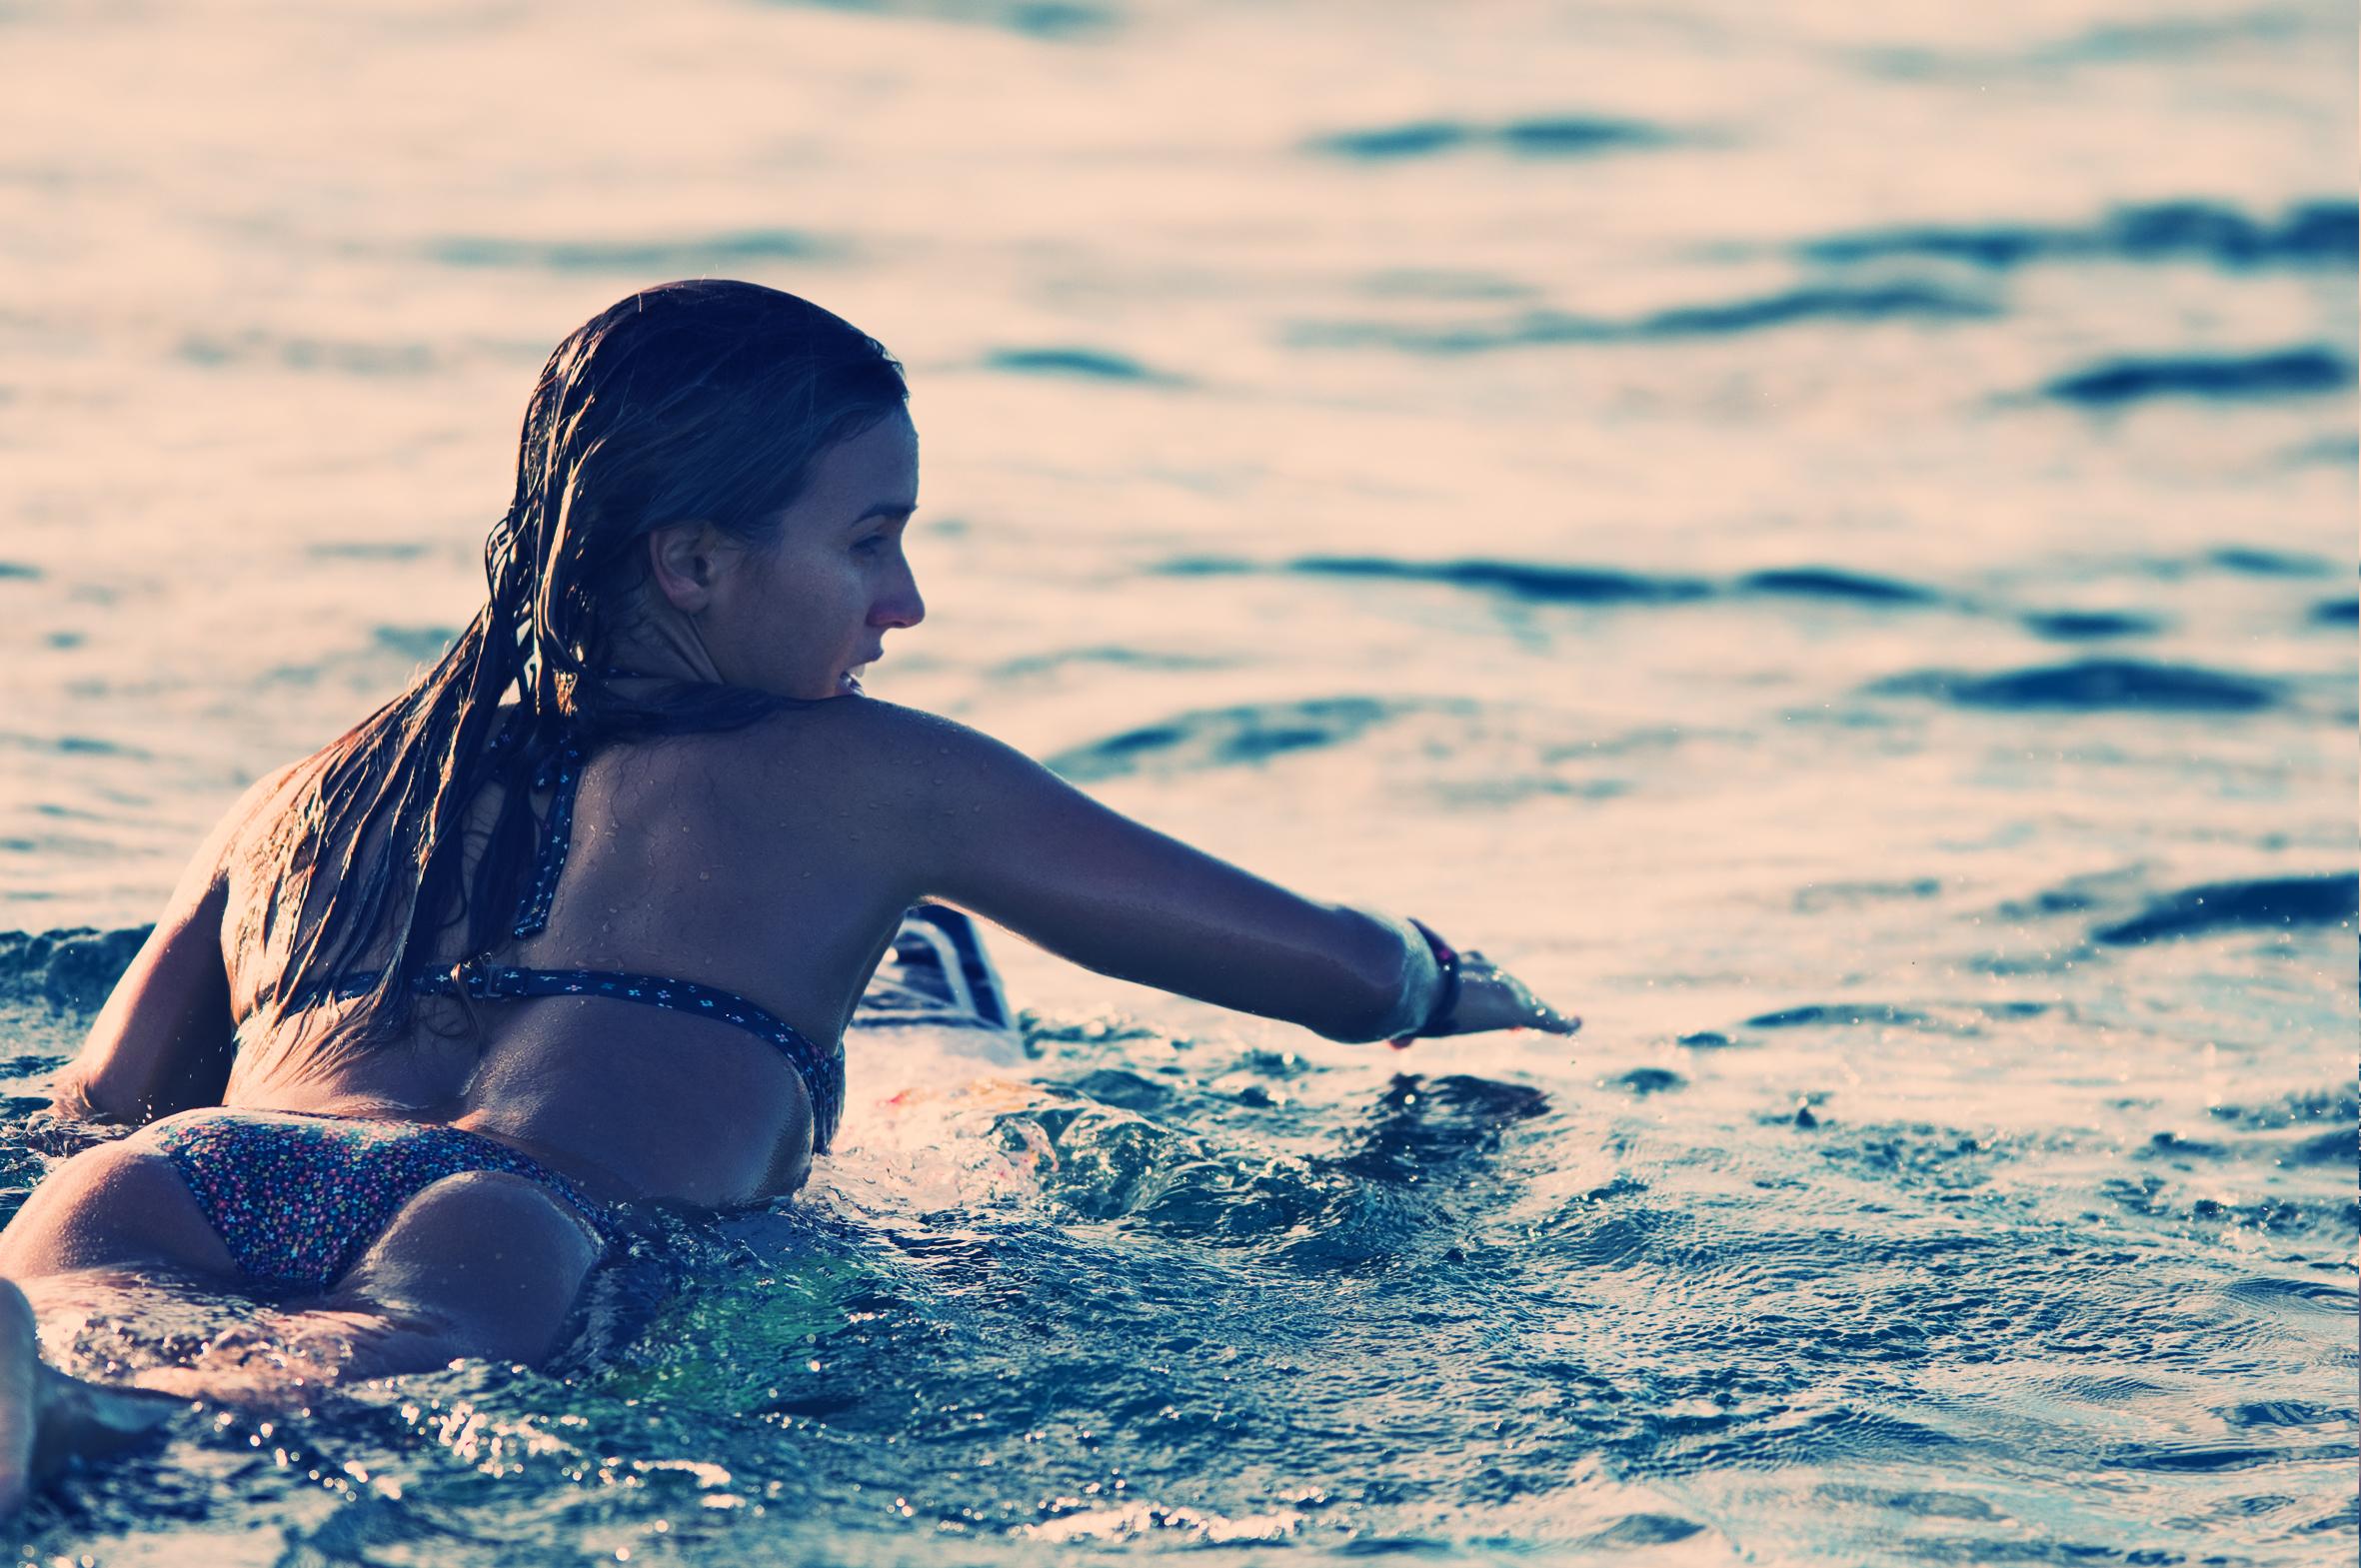 wallpaper : sports, women, model, sea, sand, beach, blue, bikini